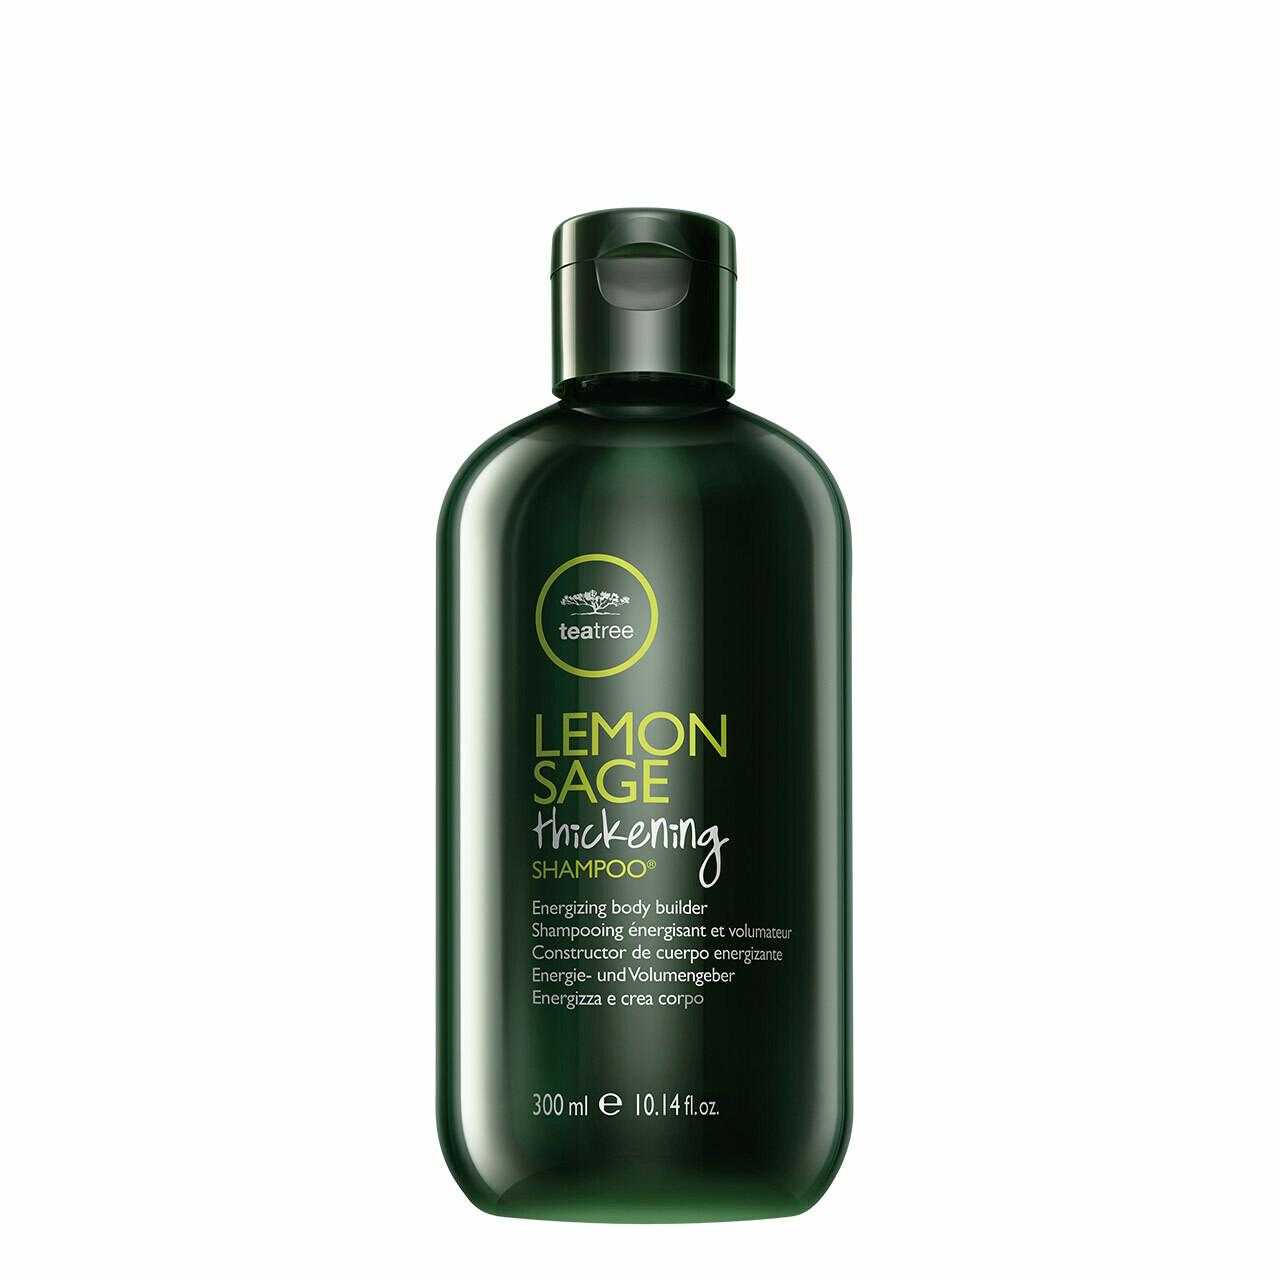 Lemon Sage Thickening Shampoo 300ml